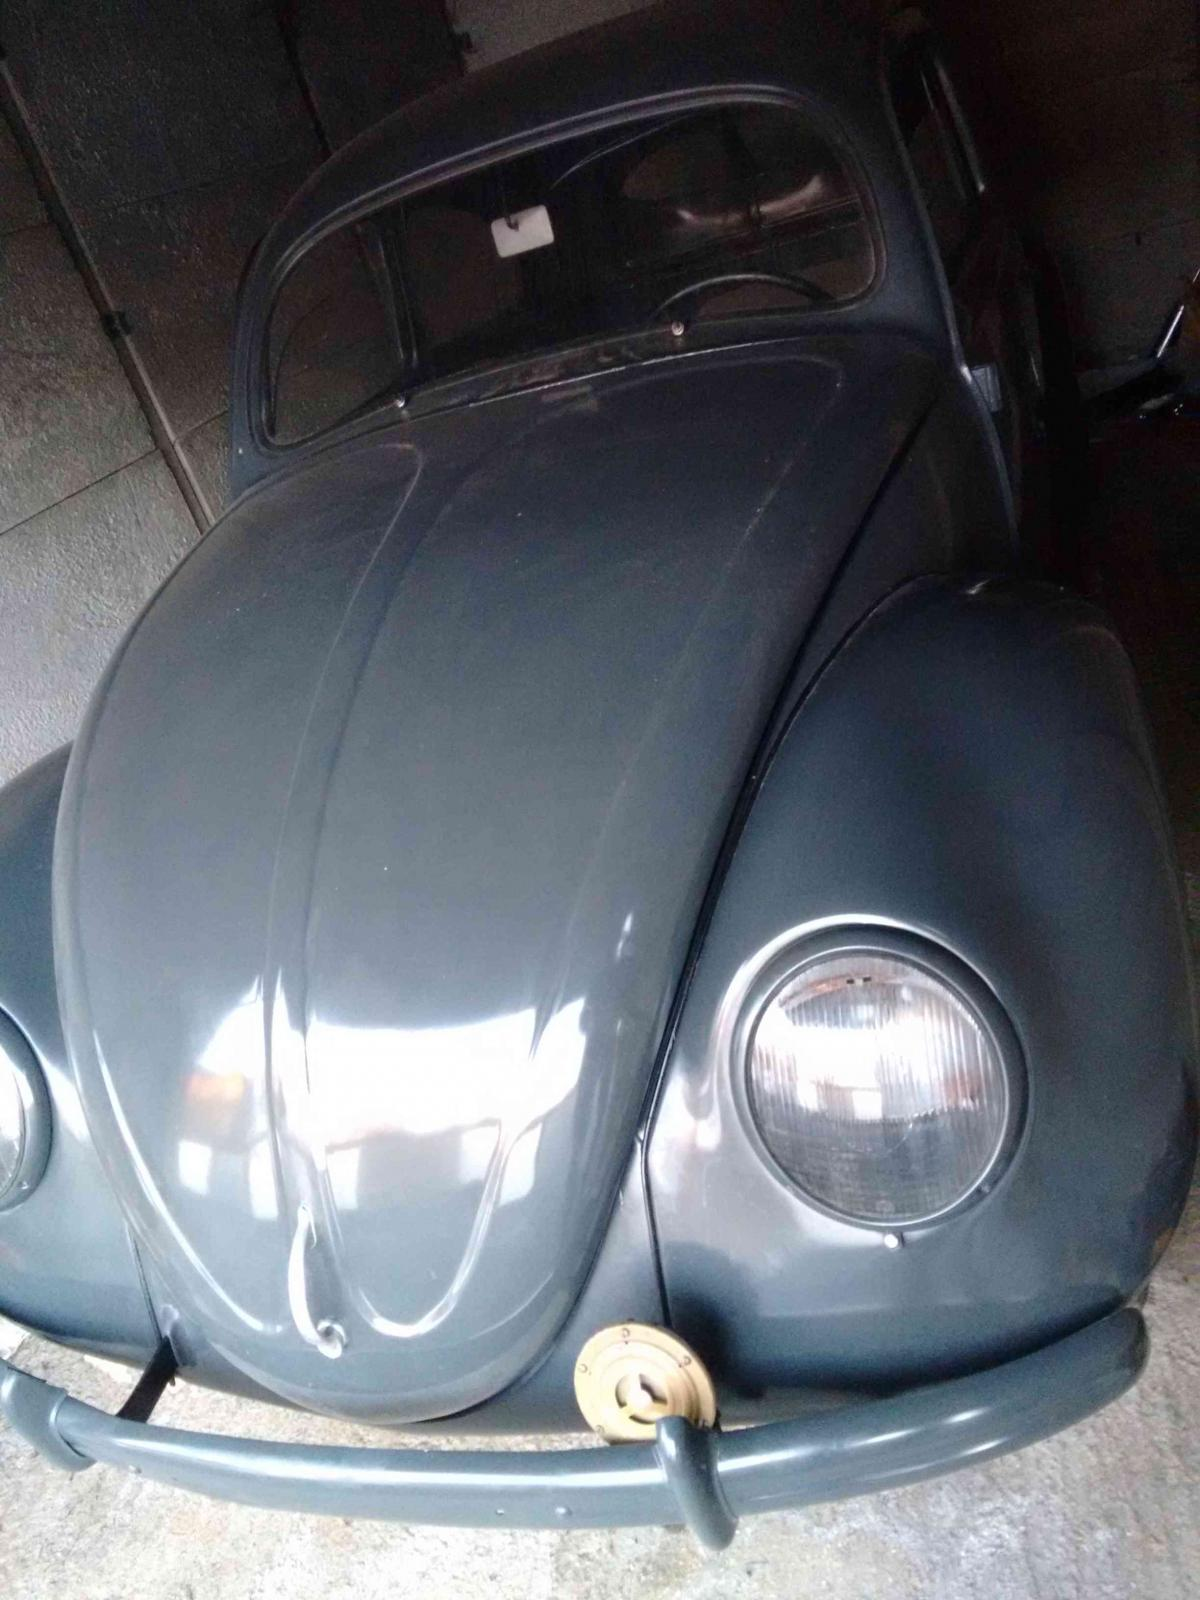 1949 VW Beetle Standard - October